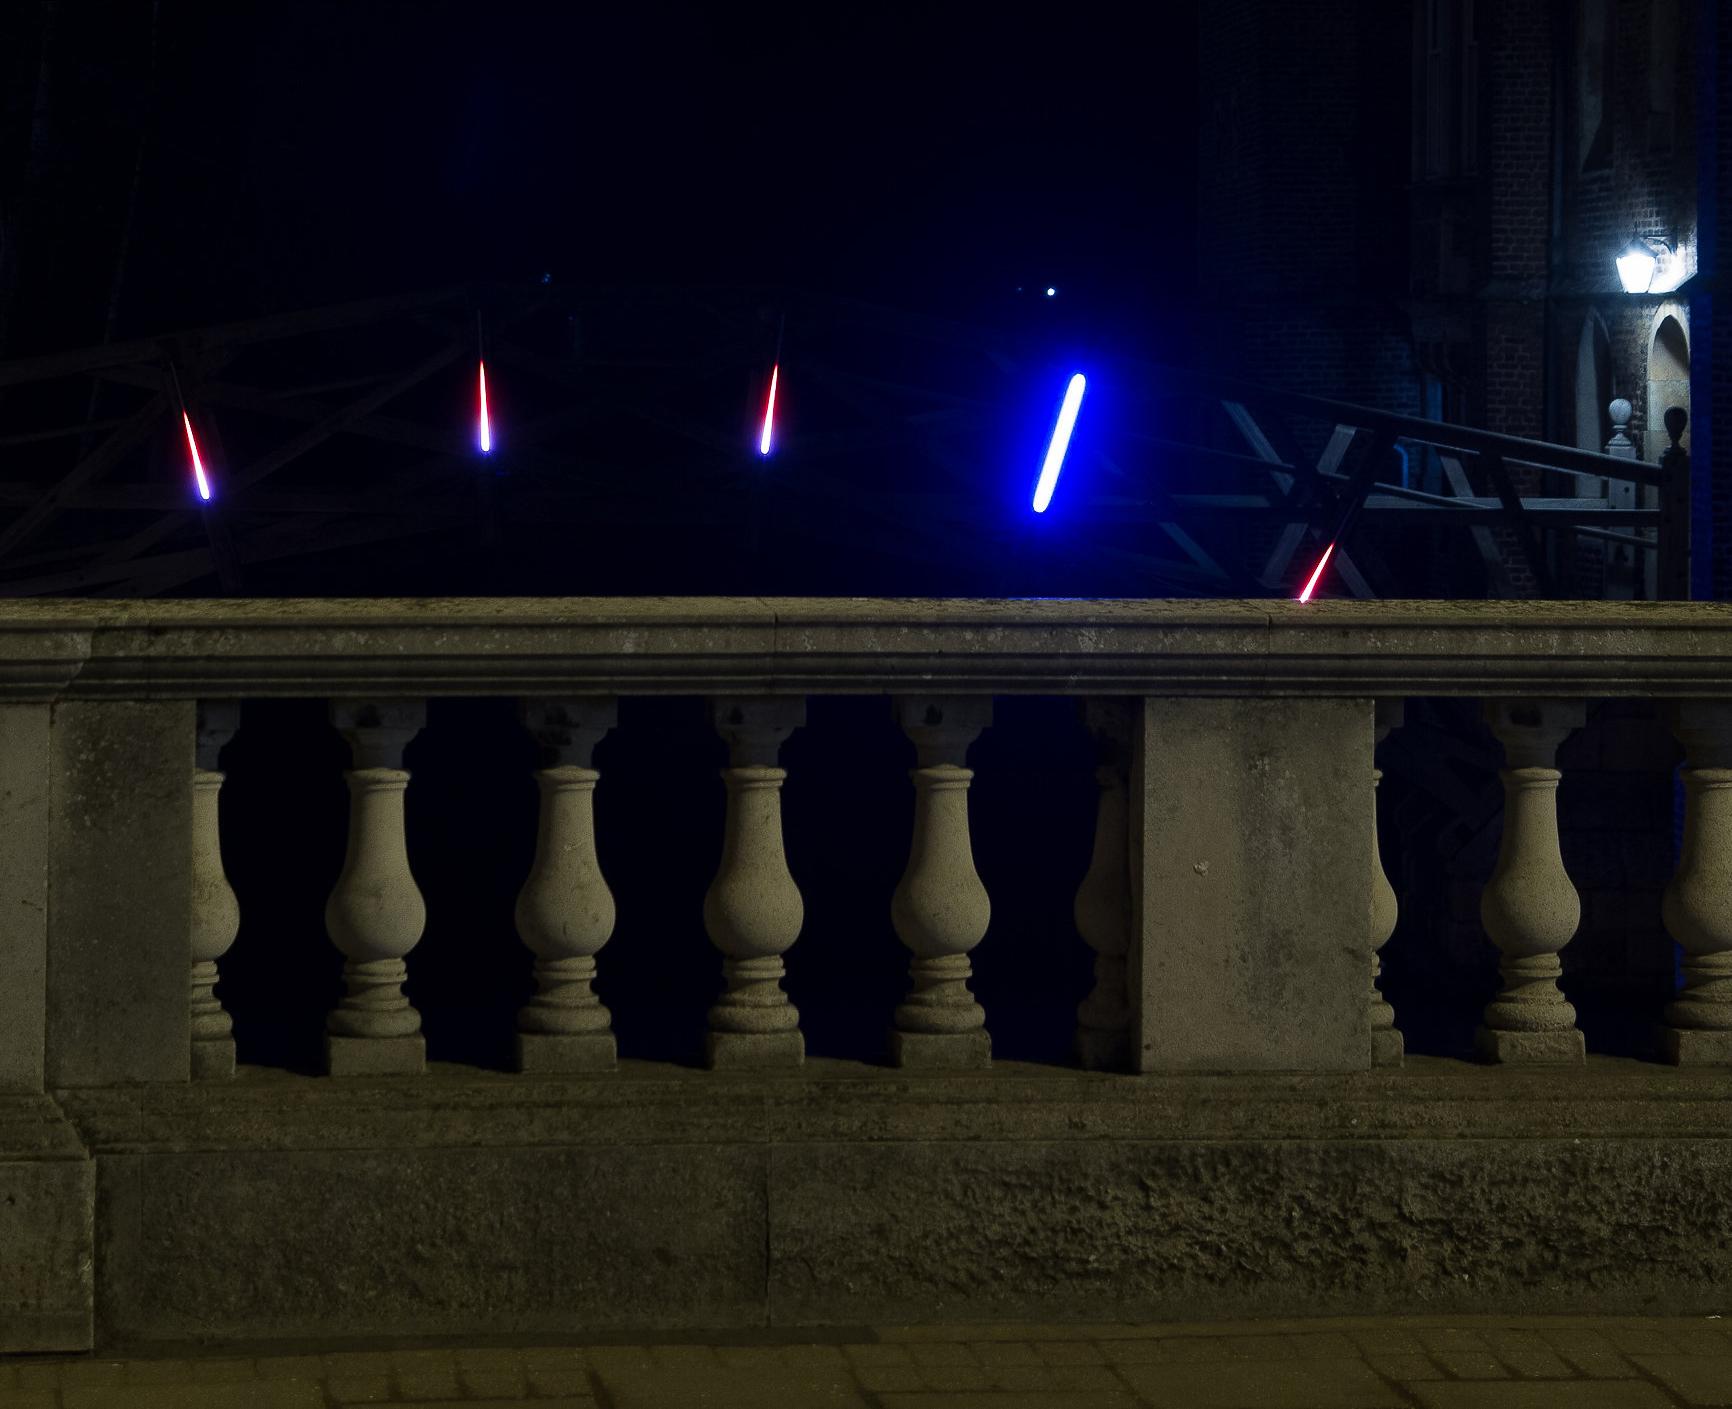 Lighting on Mathematical Bridge, Cambridge